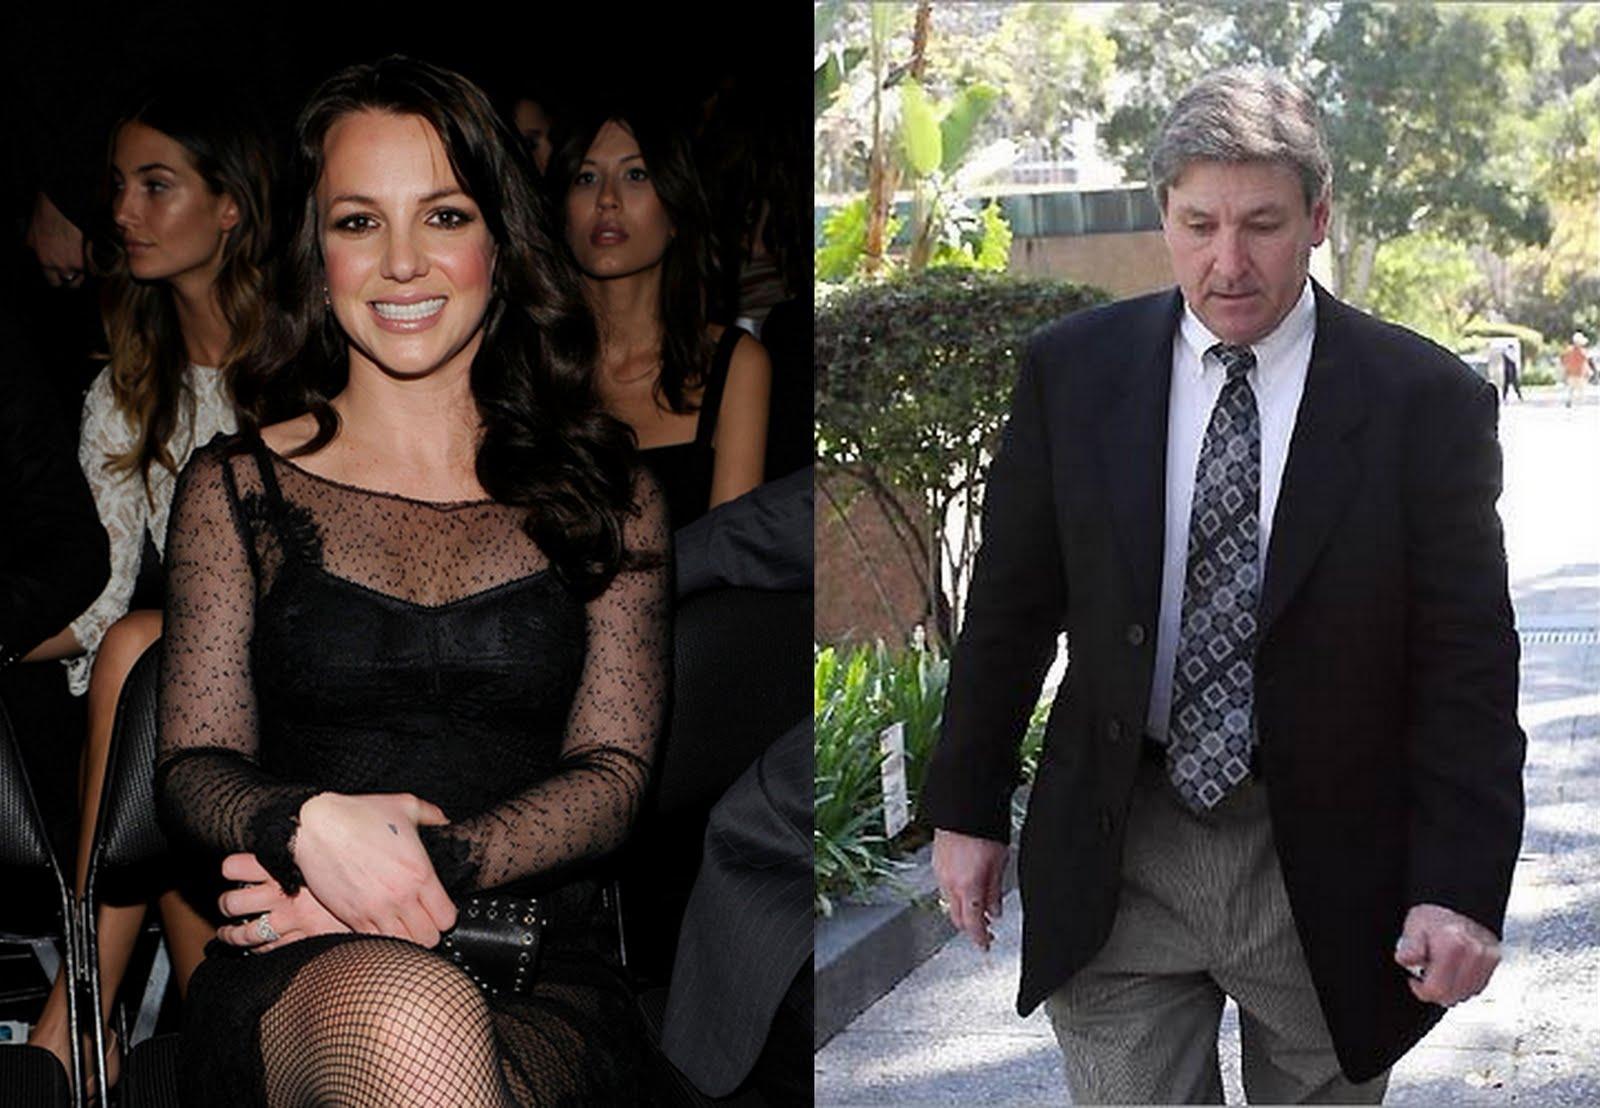 http://4.bp.blogspot.com/_v02m5EjoQxU/S9SxABpBeRI/AAAAAAAAEZI/-lGsScjCnO8/s1600/Britney+Speas+y+Lindsay+Lohan+y+sus+preocupados+papas_5.jpg